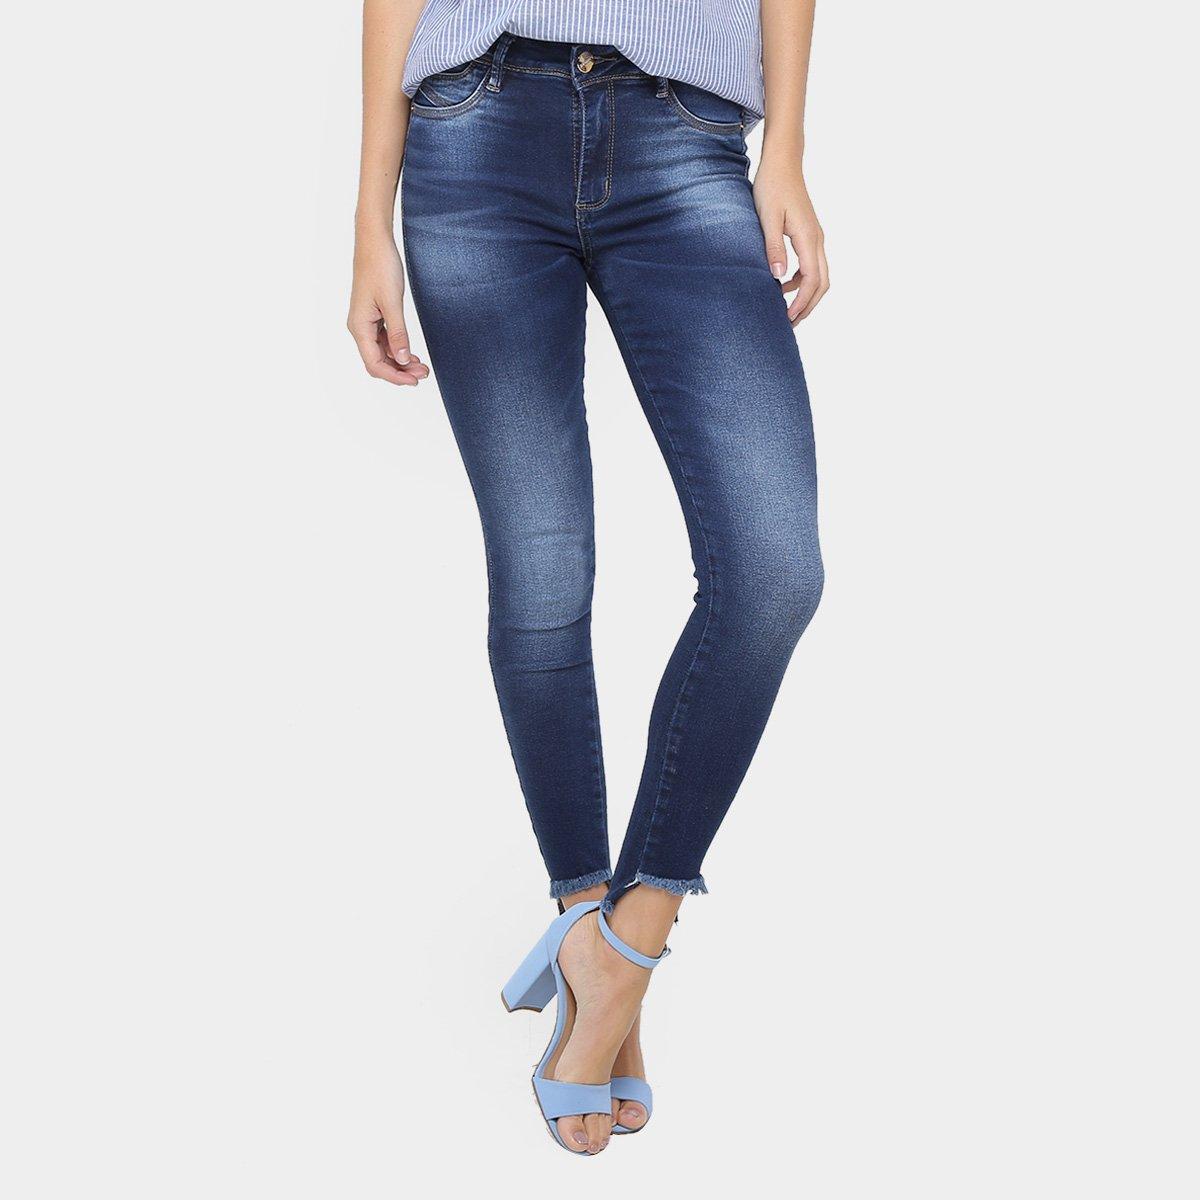 3924d43f4 Calça Jeans Skinny Sawary Barra Assimétrica Cintura Média Feminina - Compre  Agora | Zattini